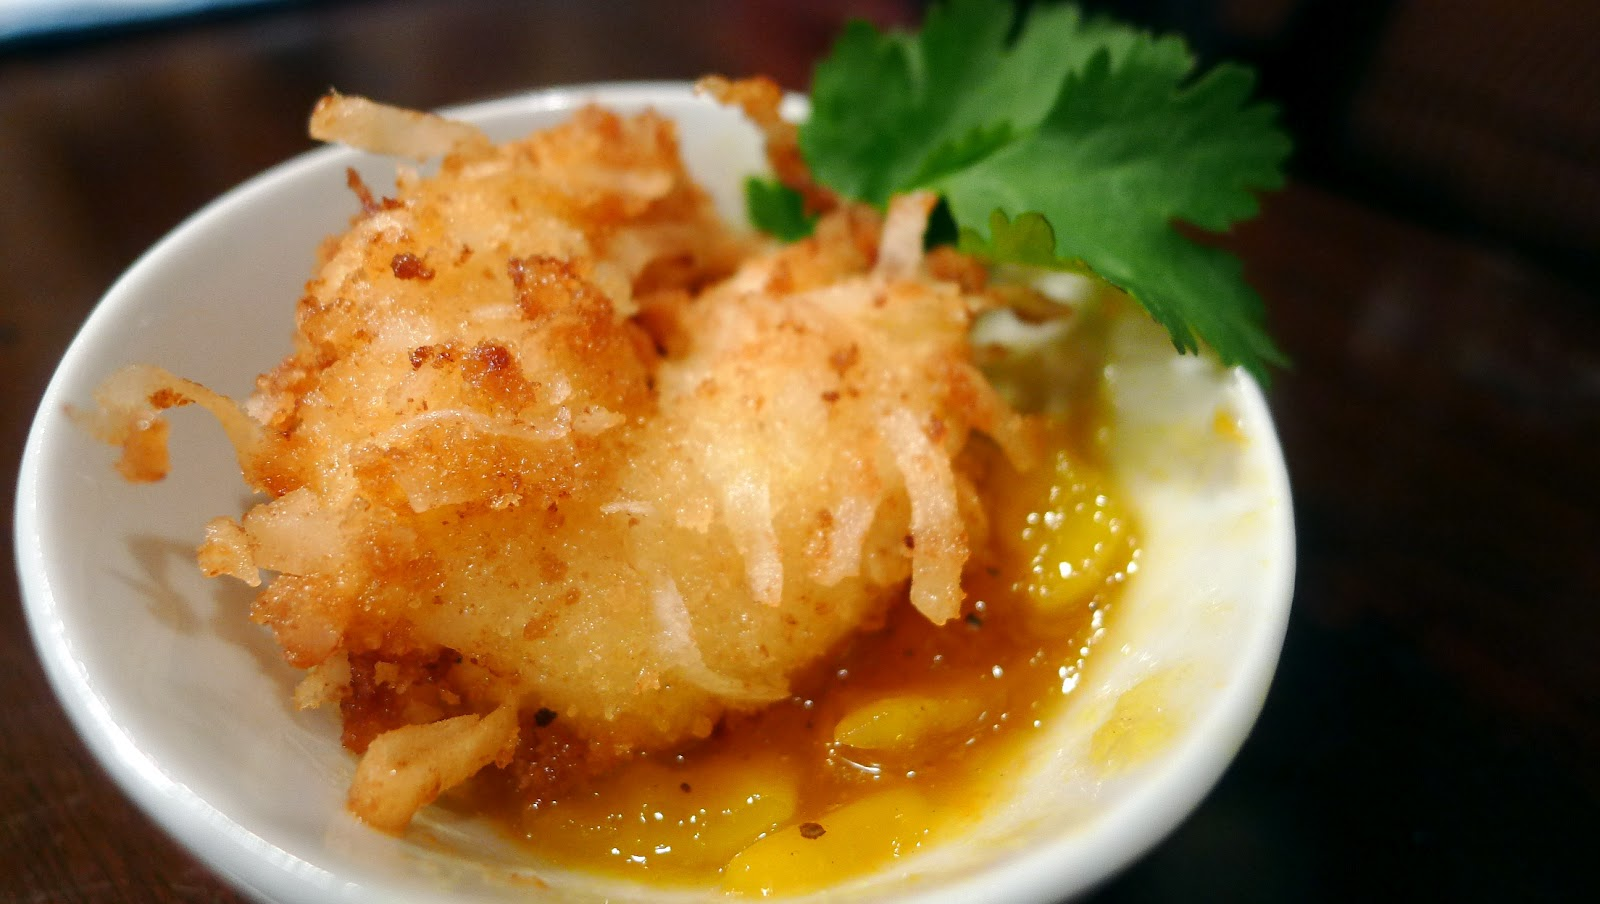 newFOOD tuesdayz: Coconut Shrimp with Mango Dipping Sauce